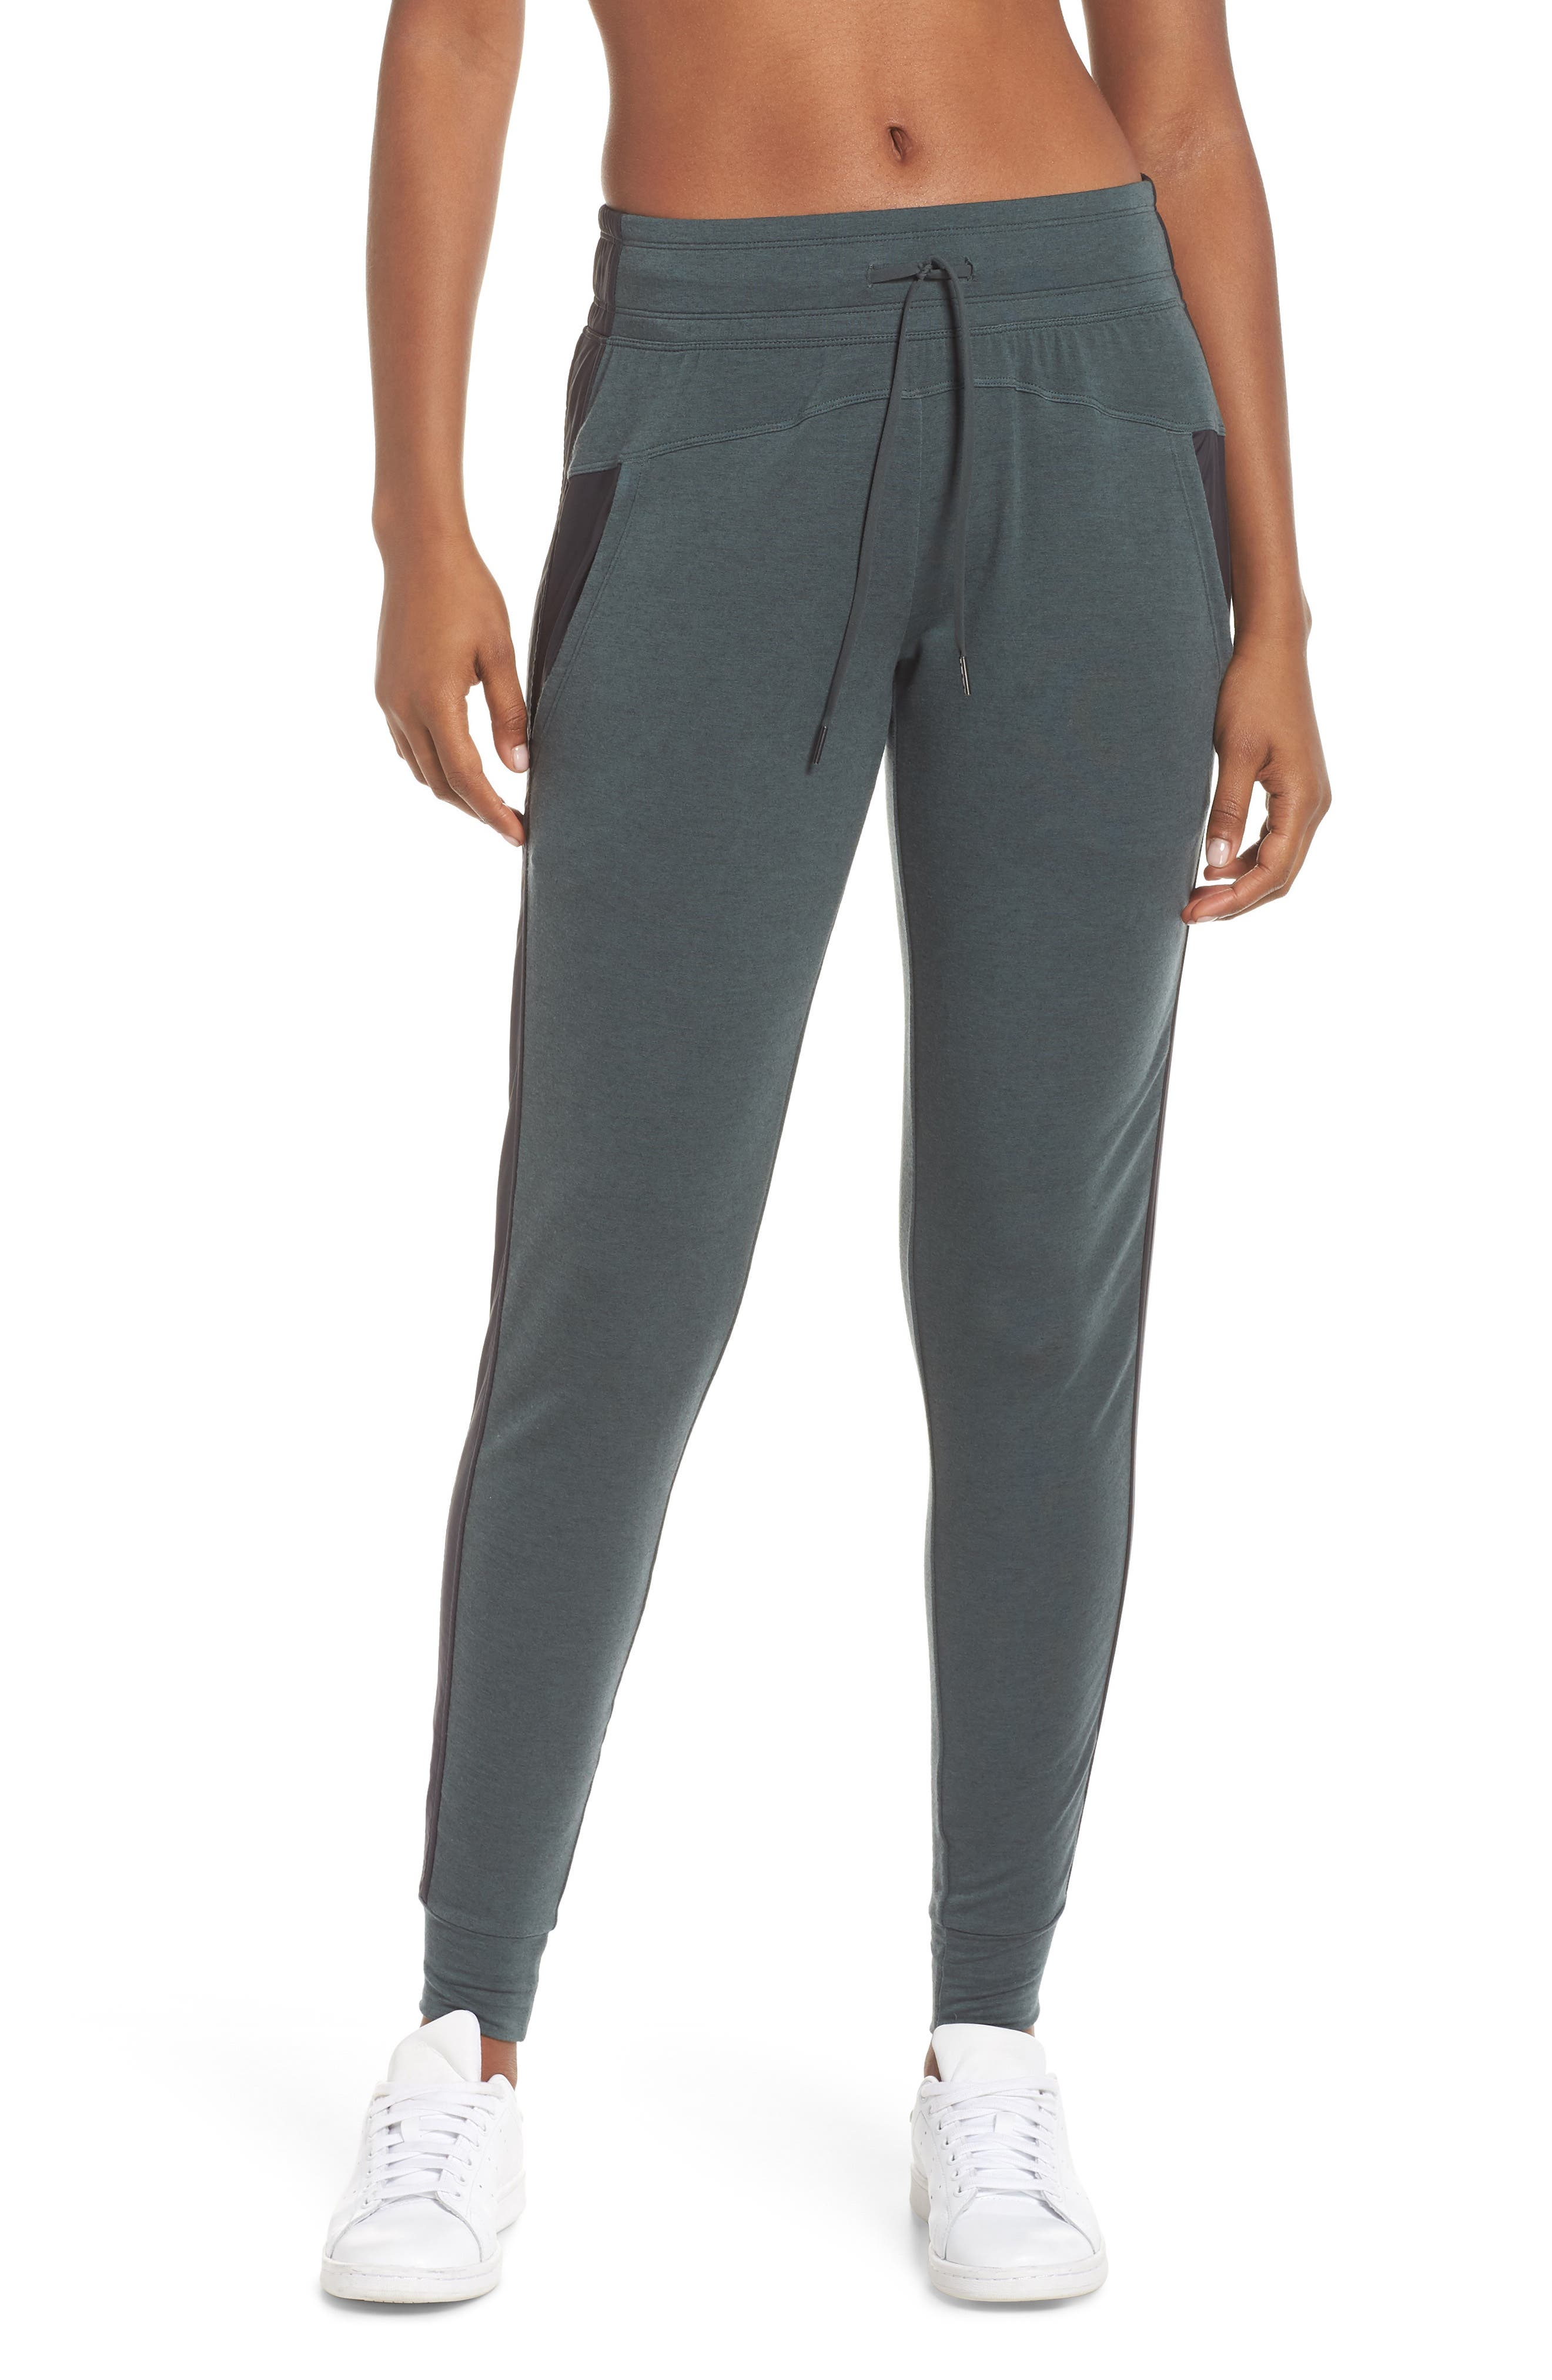 Milla Jogger Pants,                         Main,                         color, 321